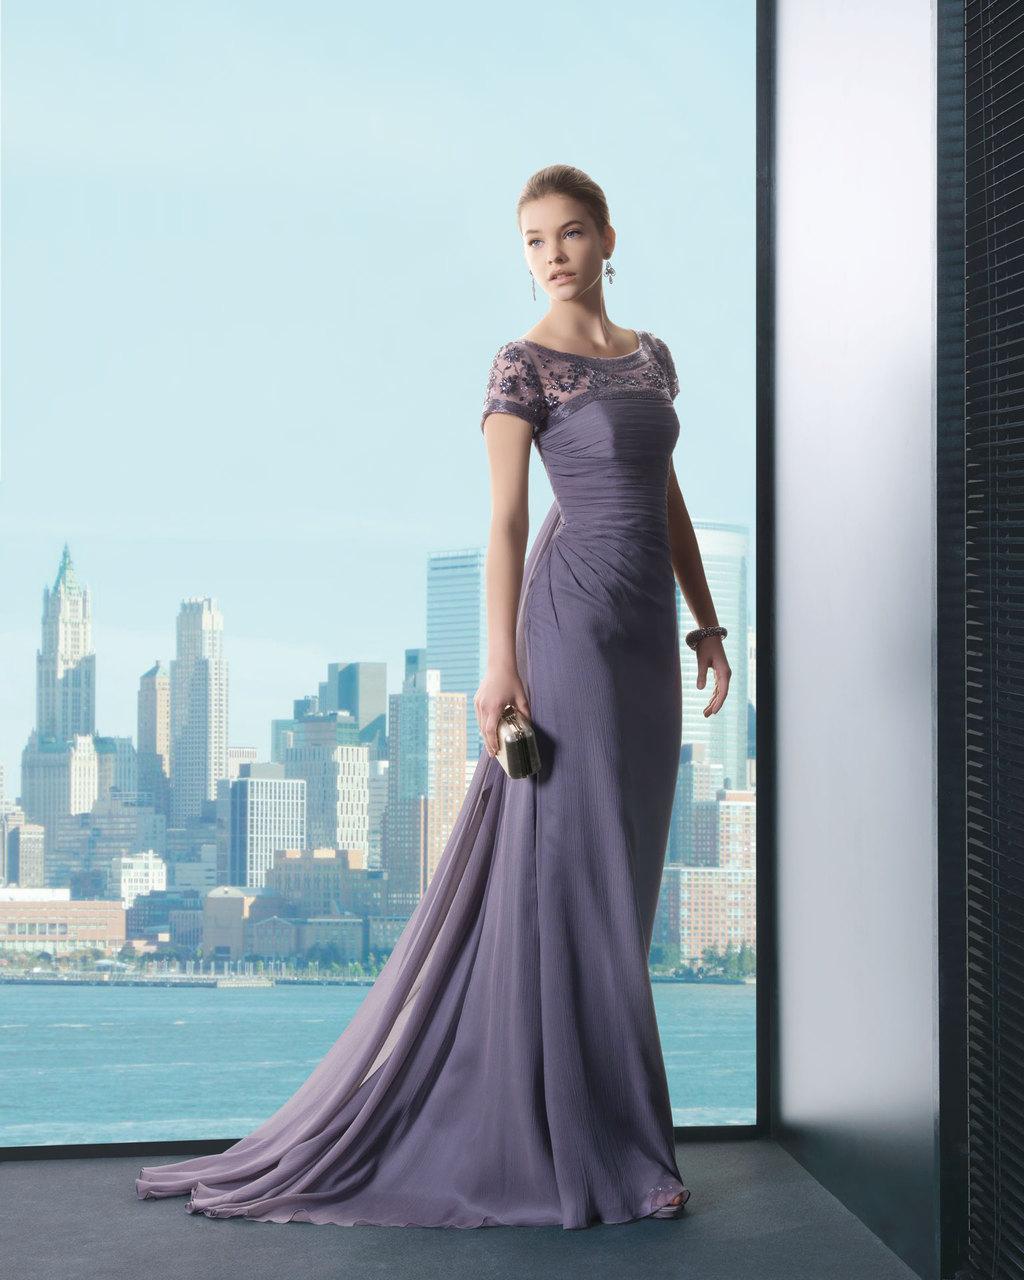 Purple mauve bridesmaid dress or MOB gown